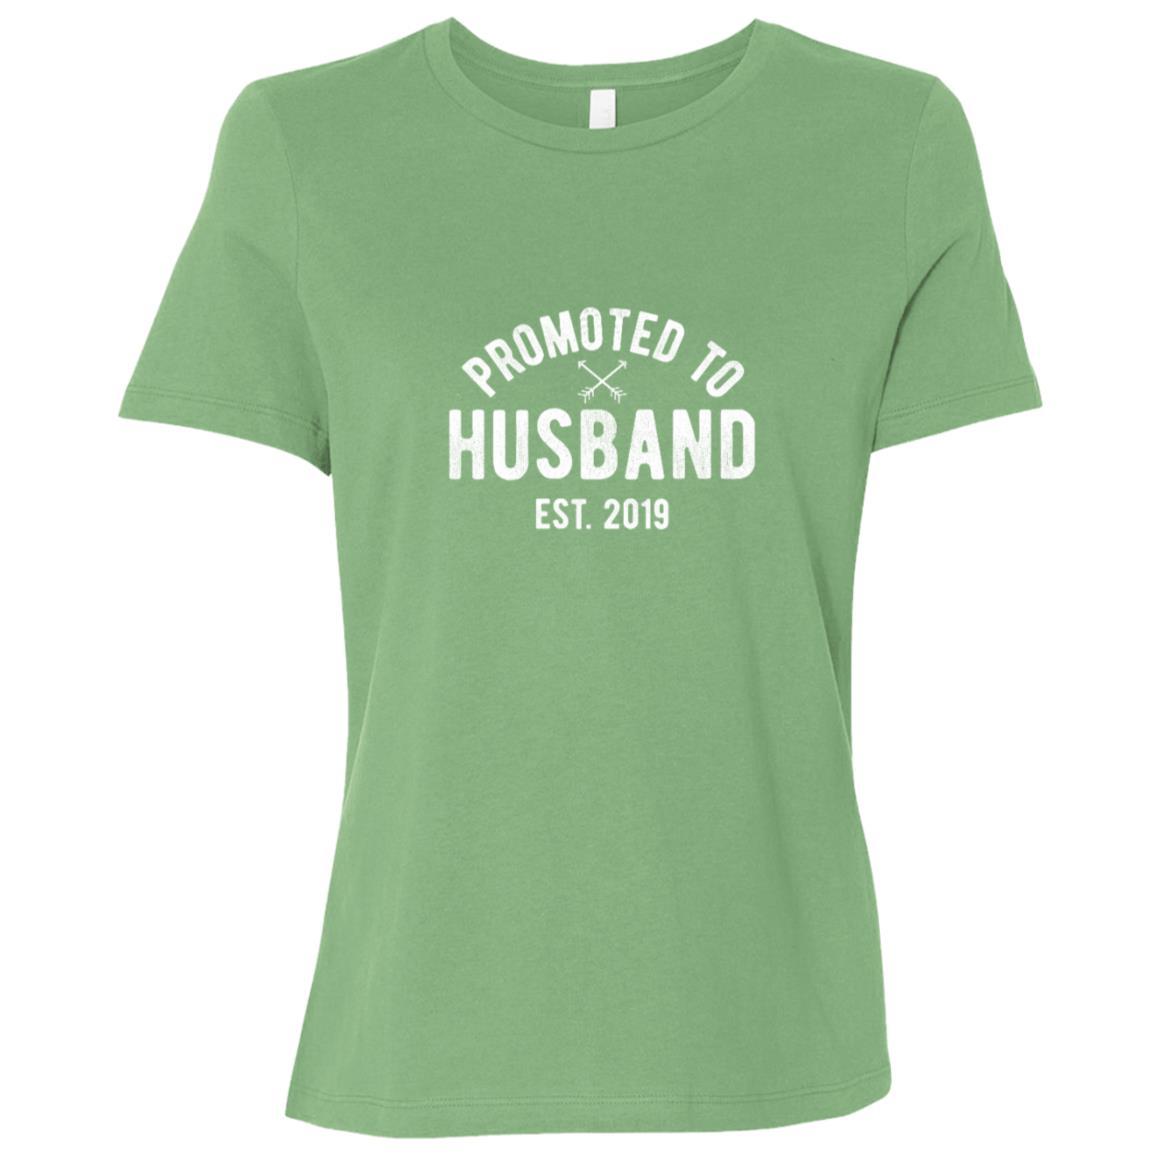 New Husband 2019 Getting Married Groom Gift Tee Women Short Sleeve T-Shirt